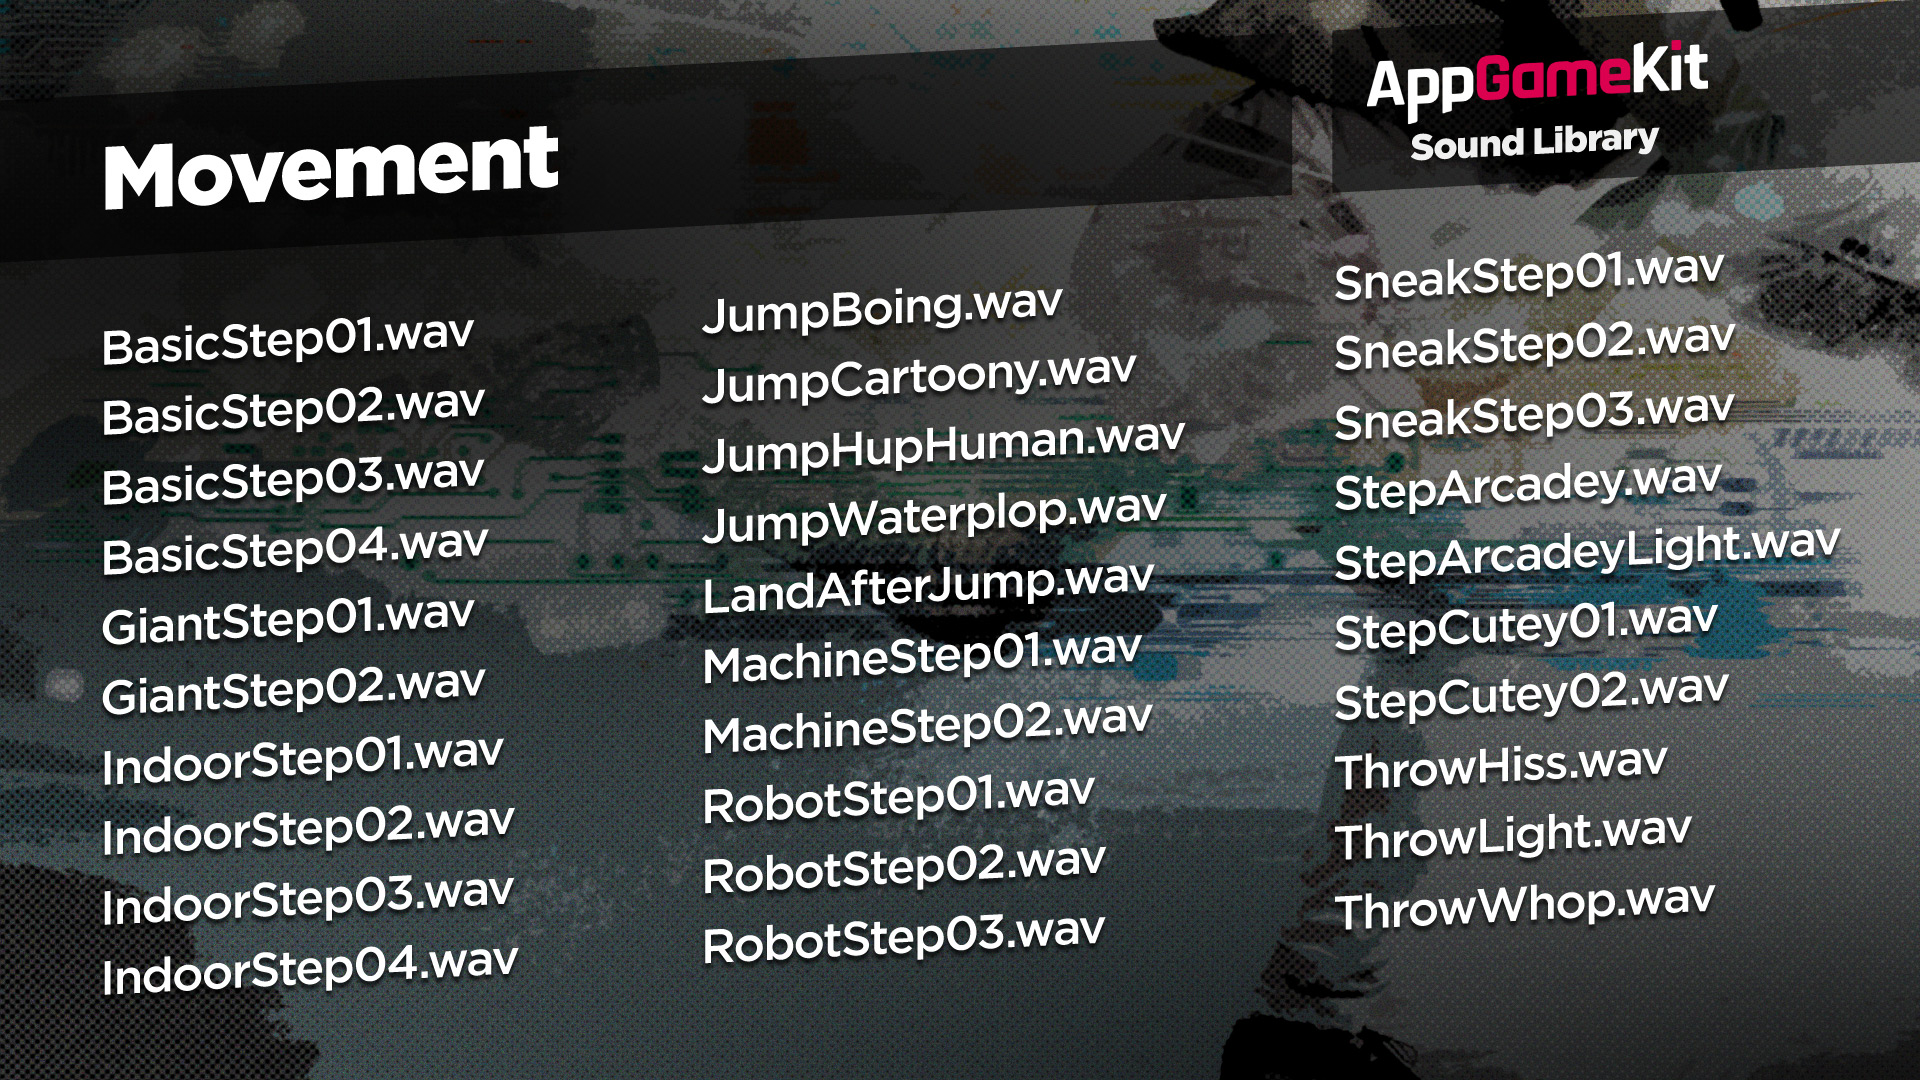 AppGameKit Sound Library screenshot